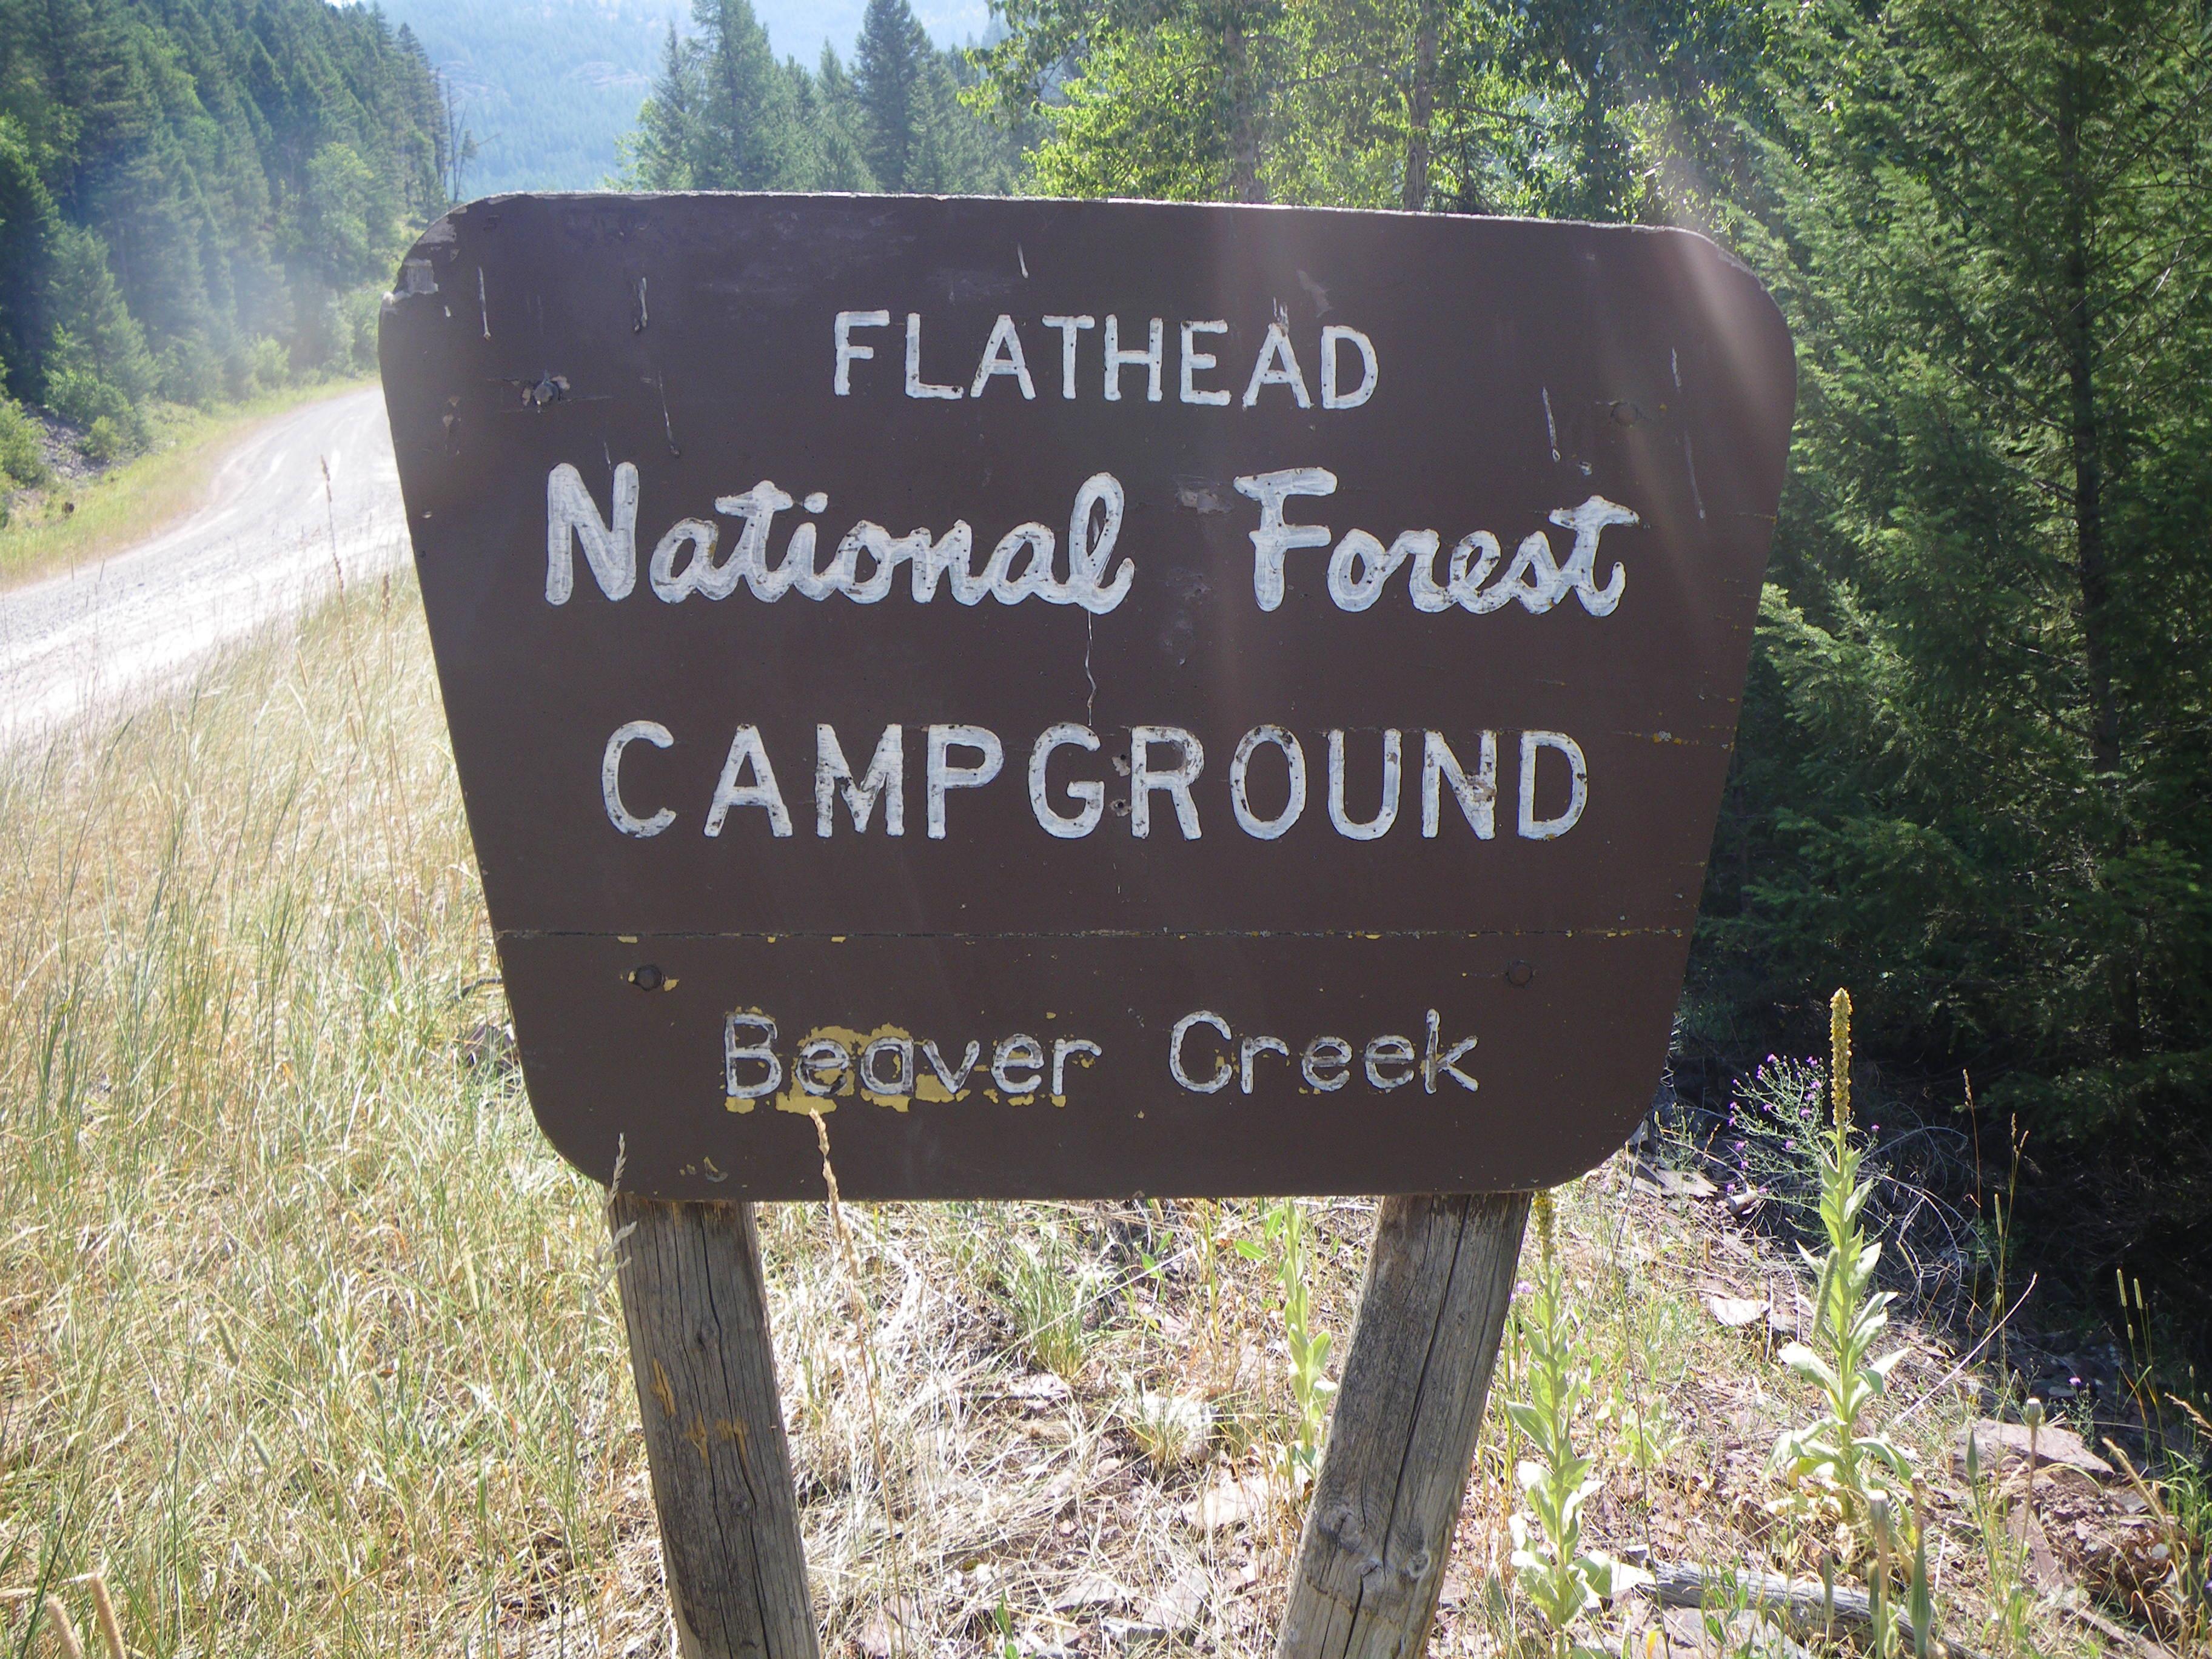 Beaver Creek campground sign